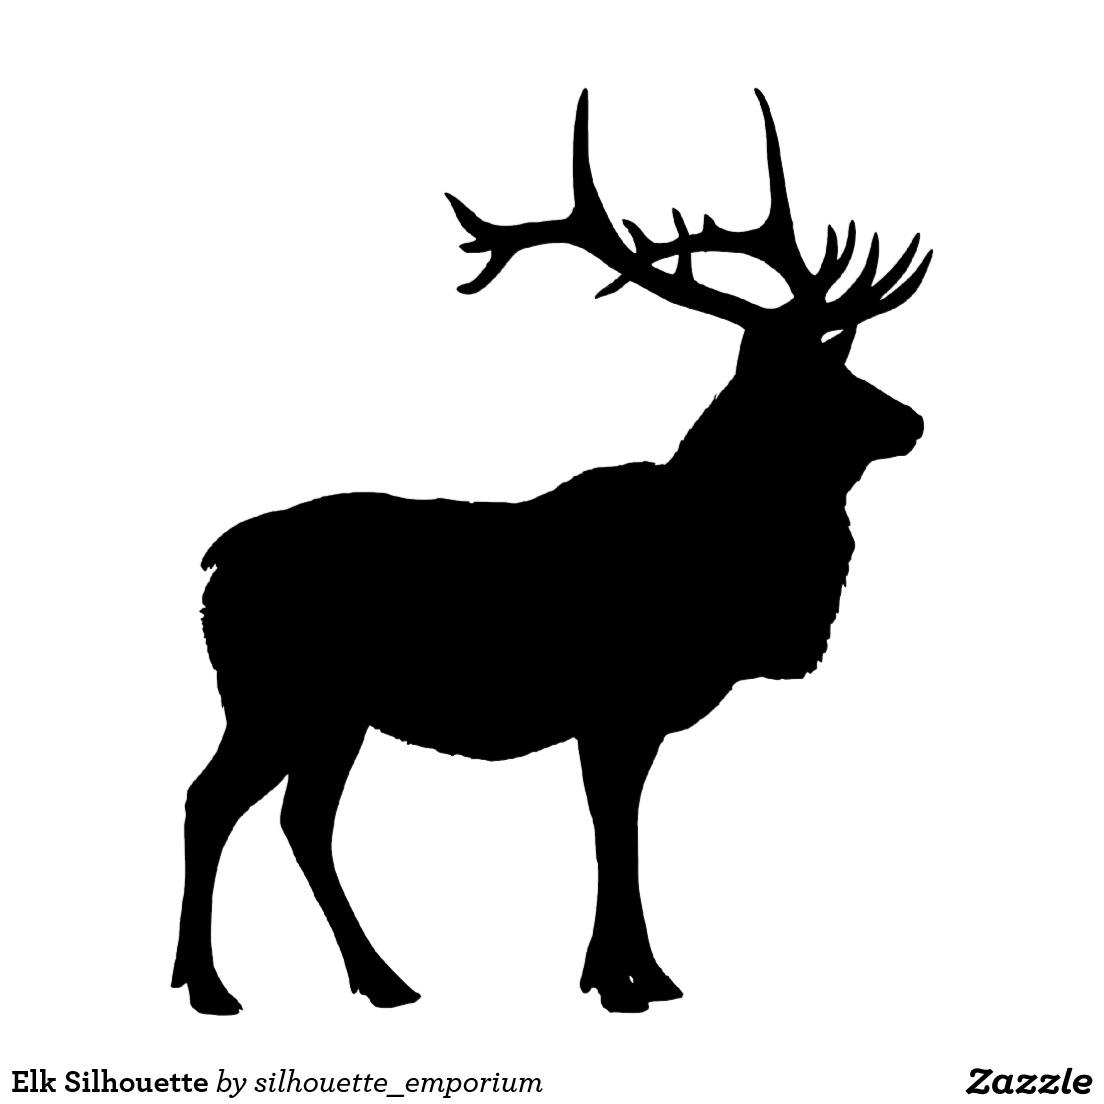 Free Elk Silhouette, Download Free Clip Art, Free Clip Art.